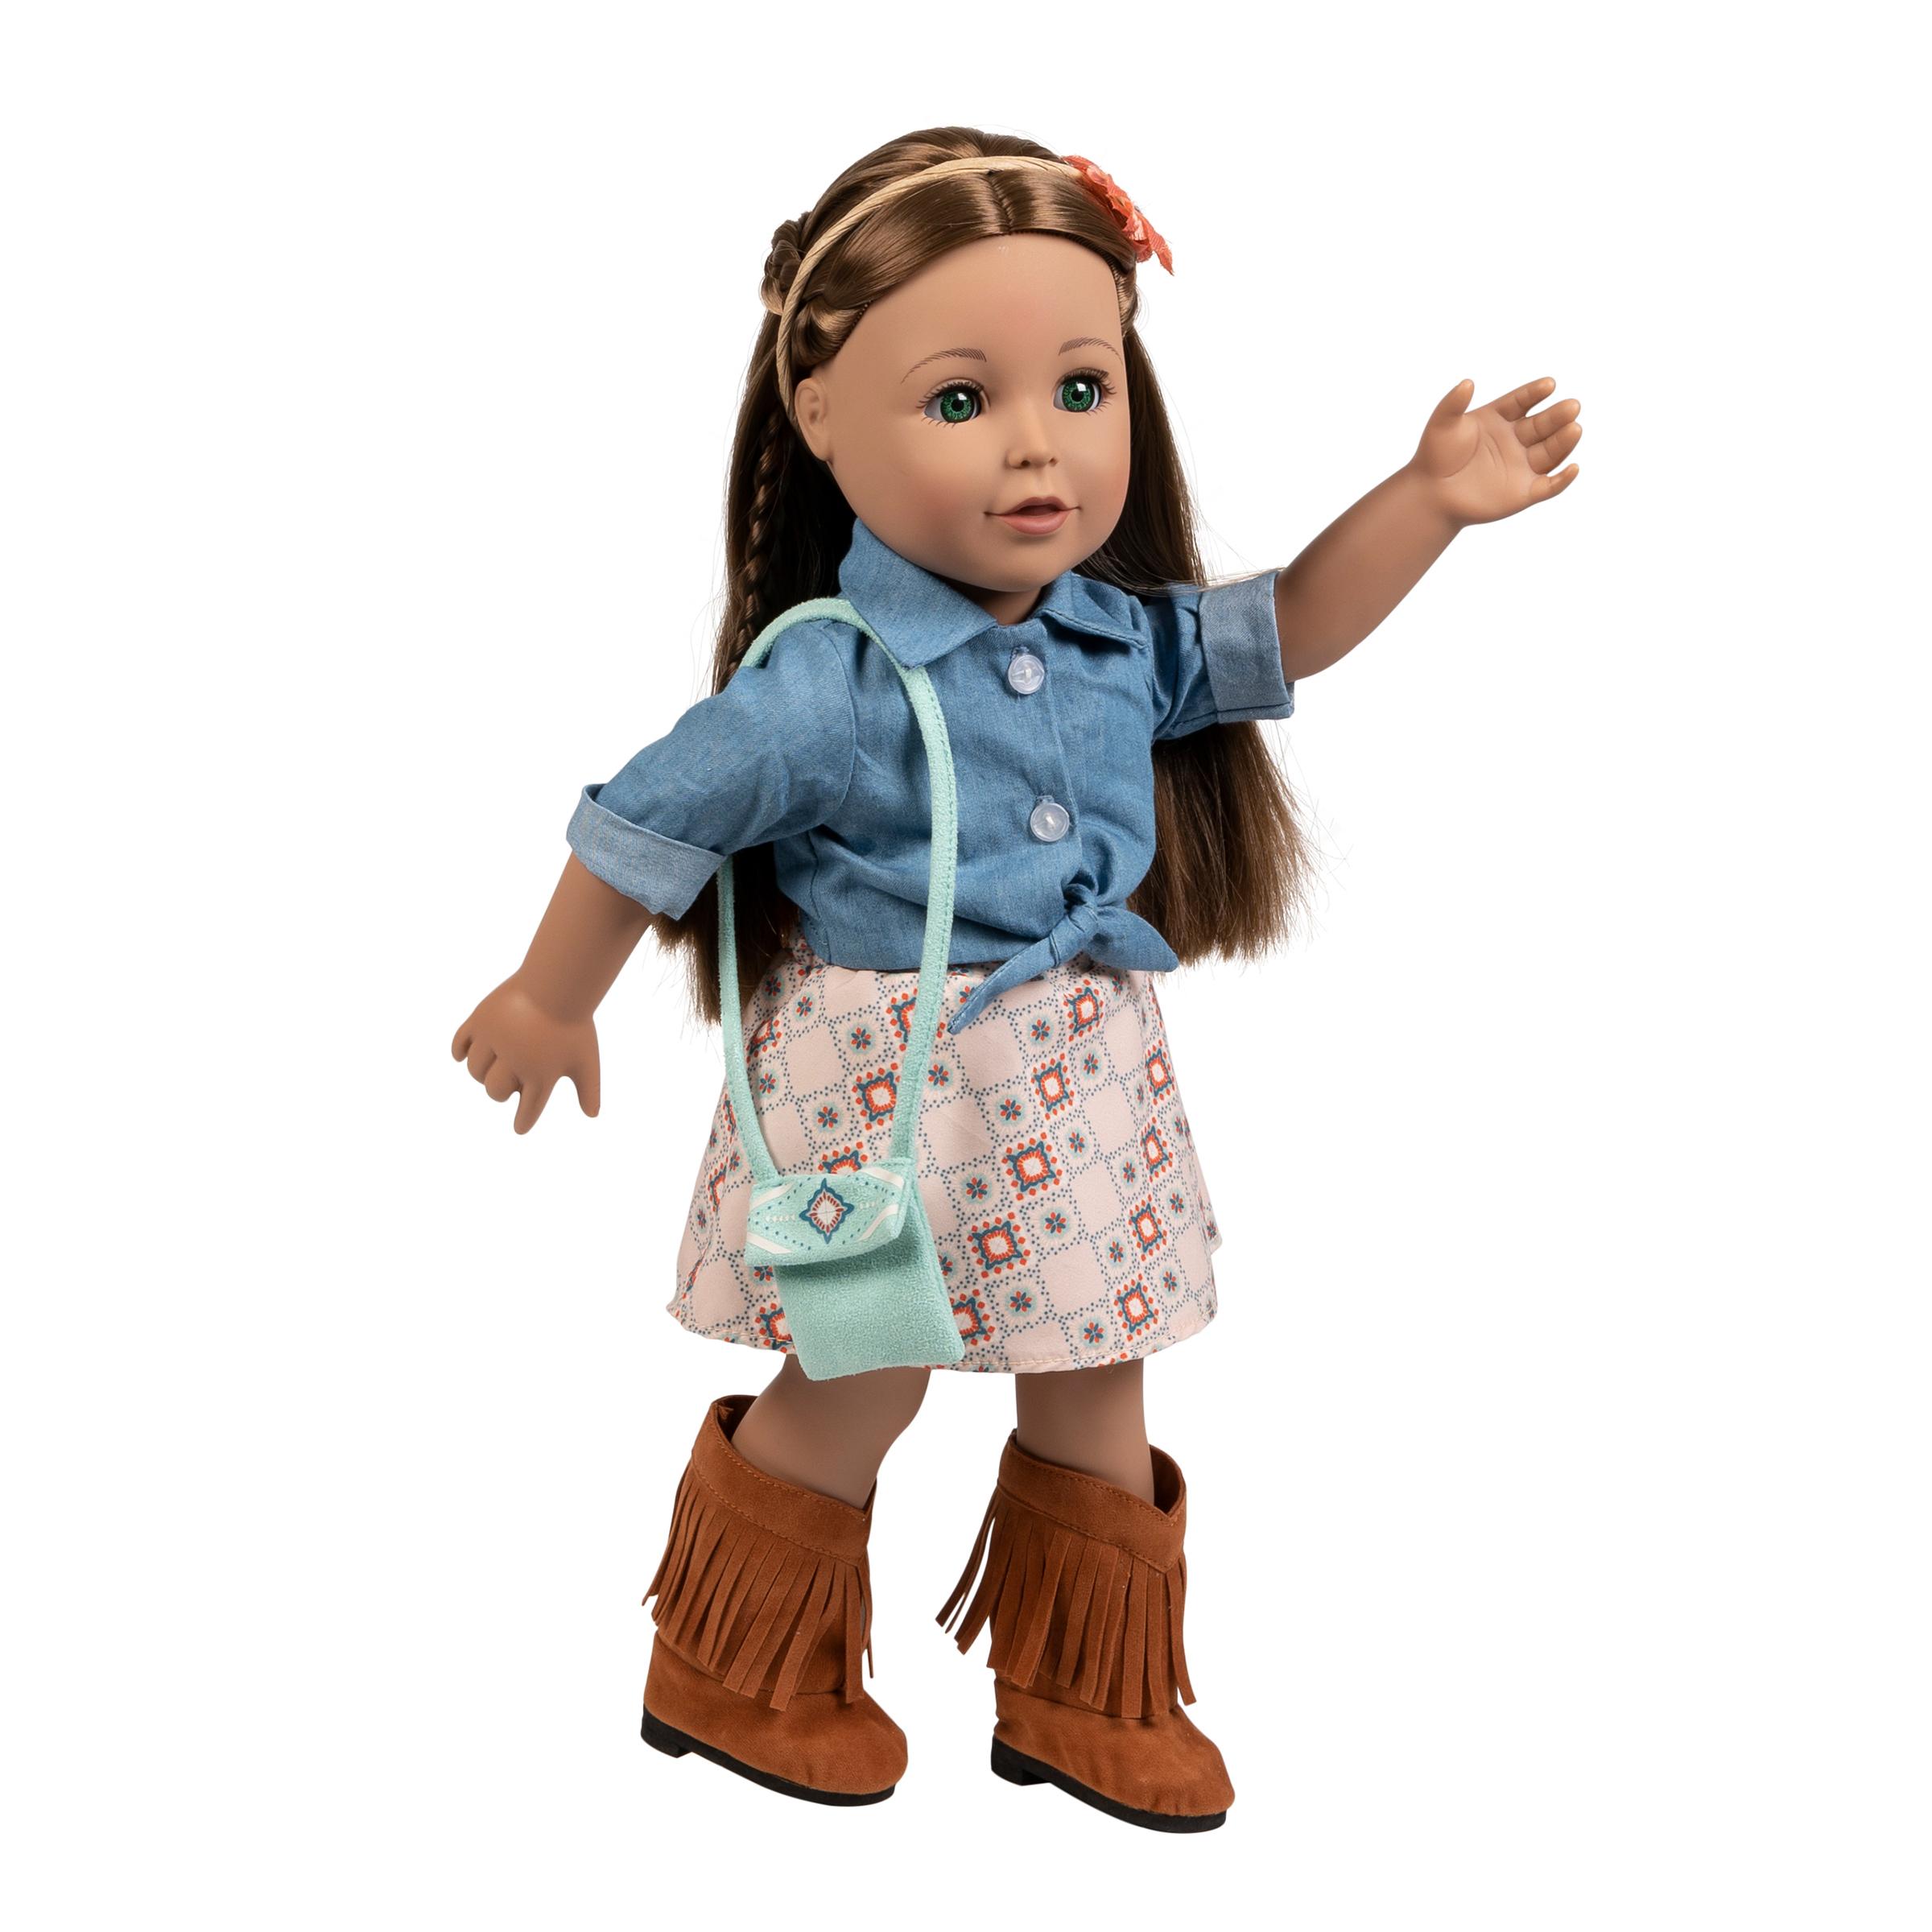 Adora Amazing Girls 18-inch Doll Cassidy